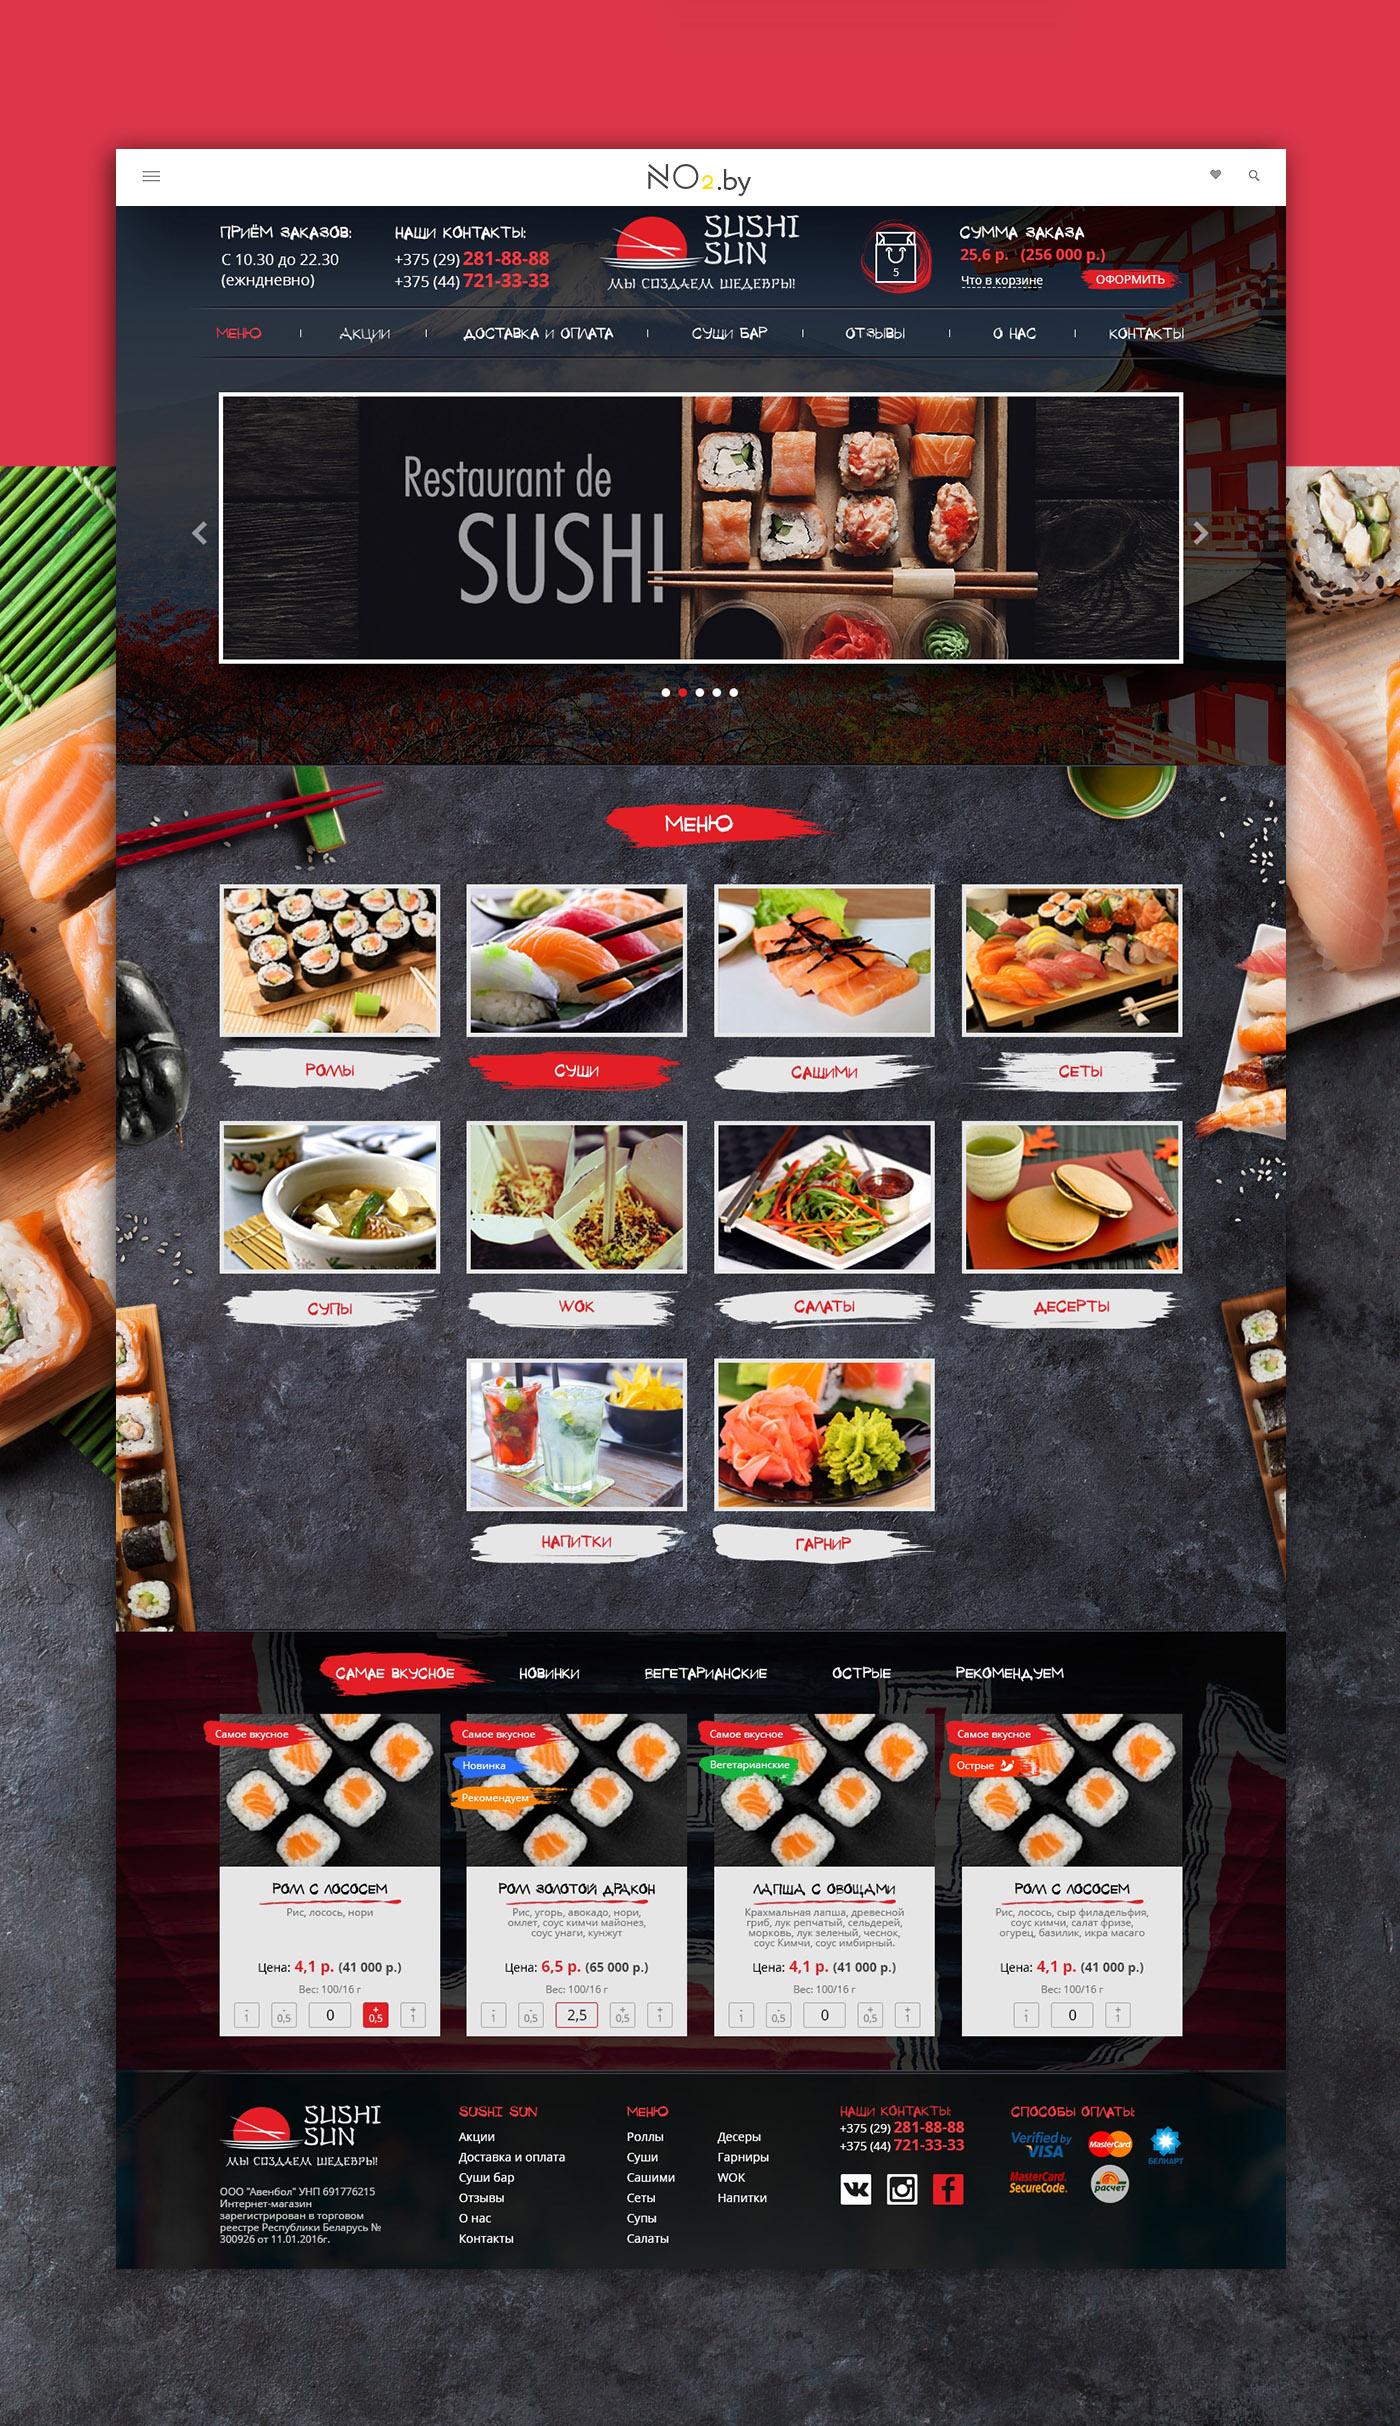 Создание сайта по доставке суши в Минске Sushi-Sun.by на MODX. Версия 2.0